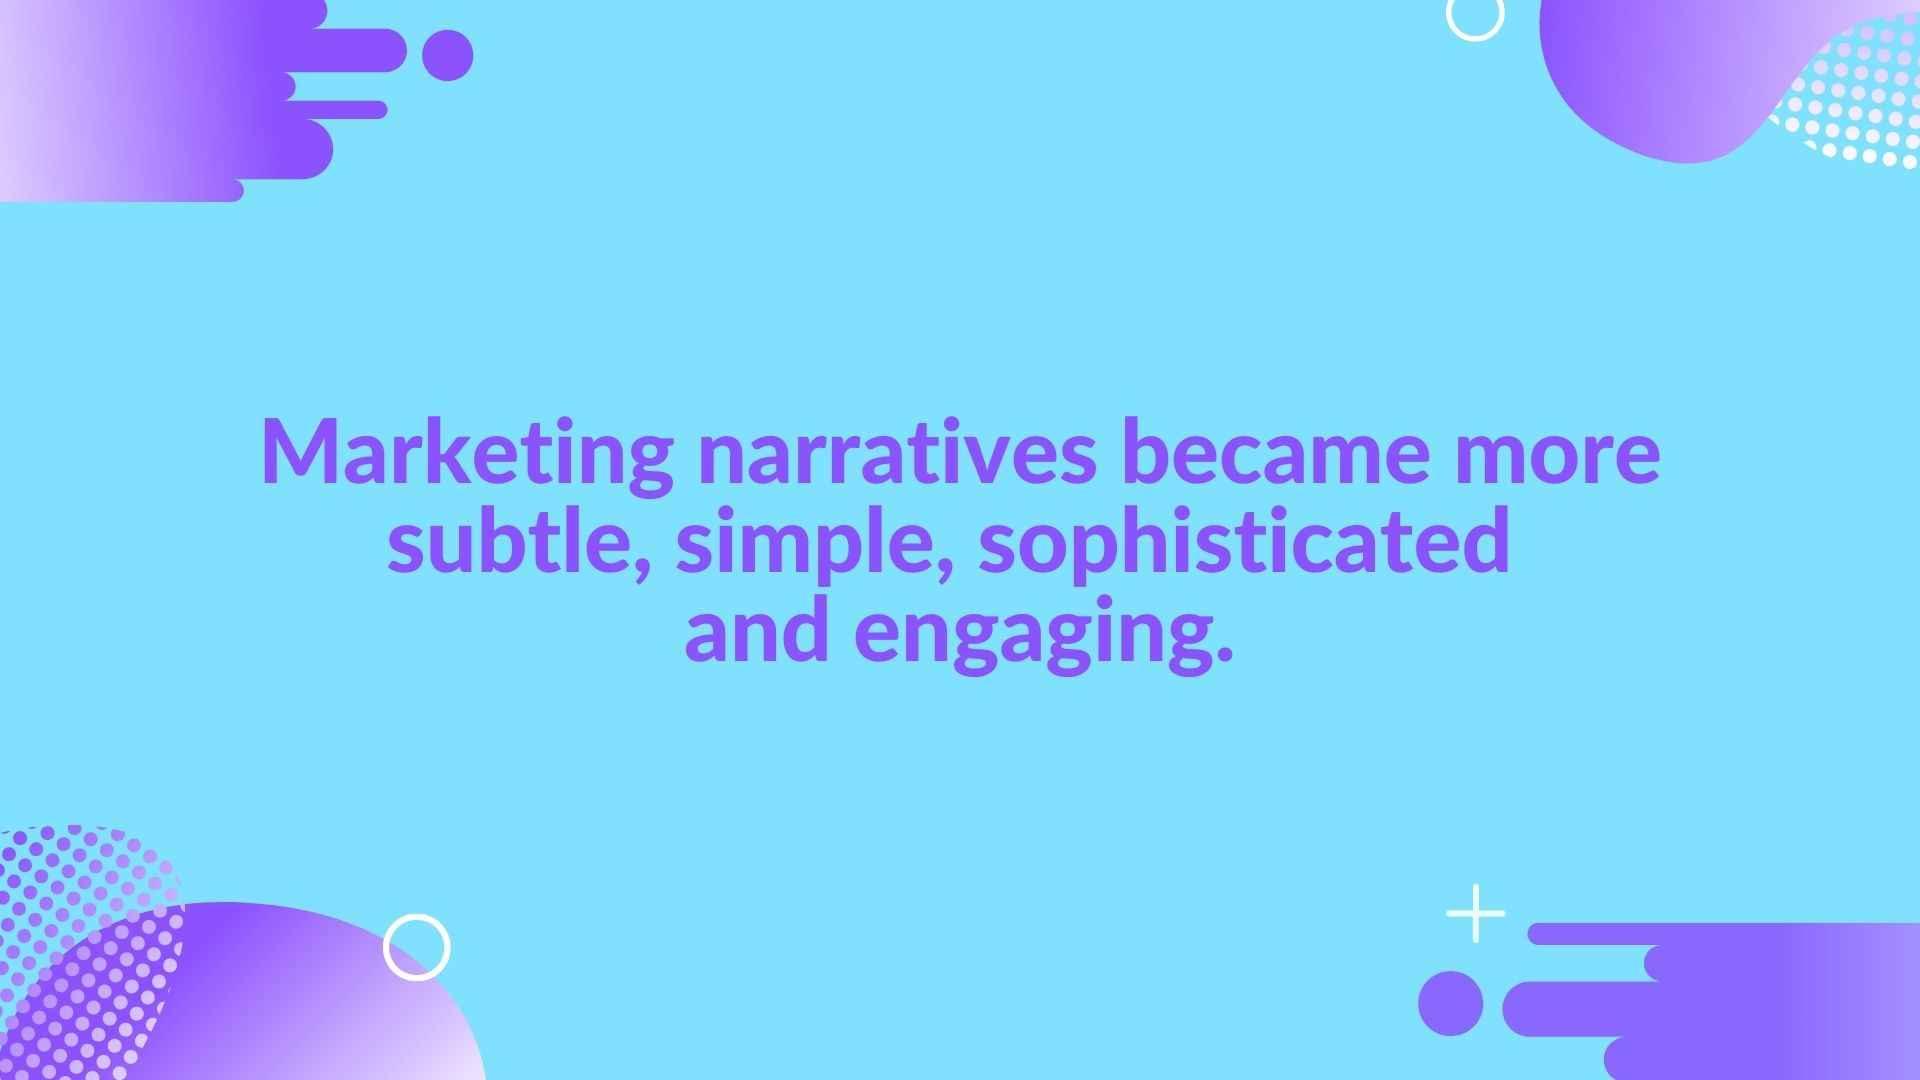 Marketing narratives